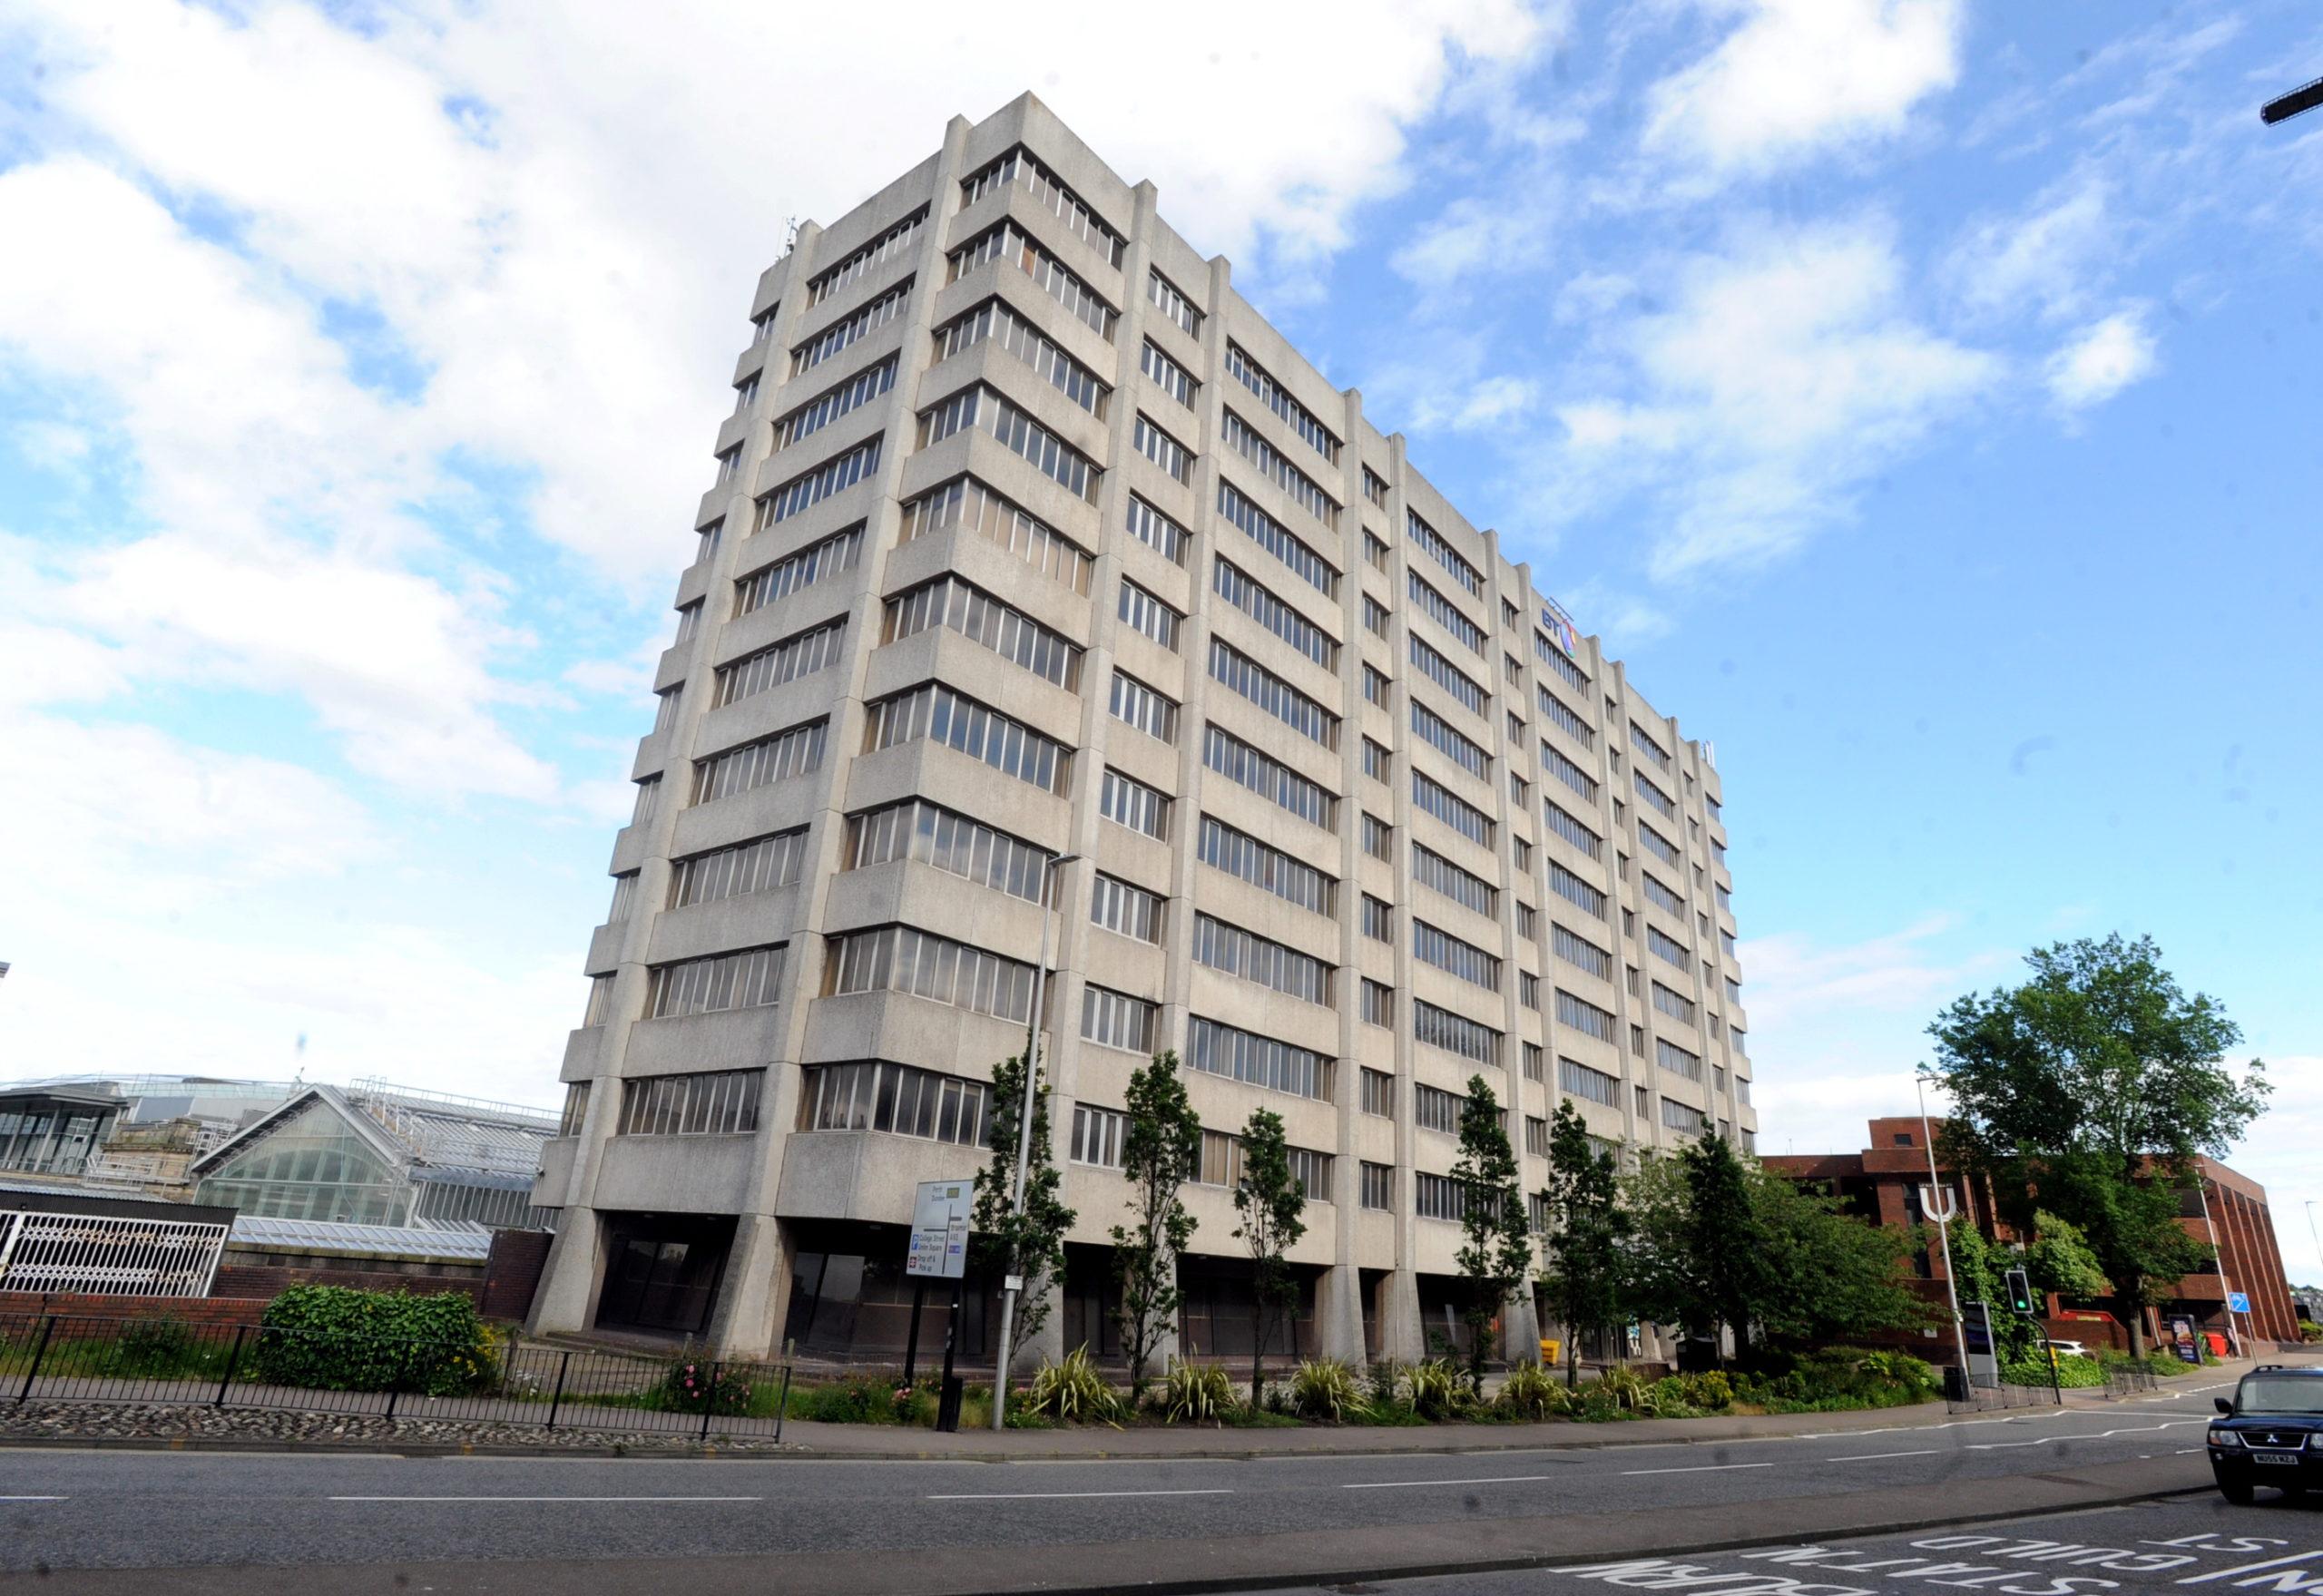 New Telecom House on Aberdeen's College Street